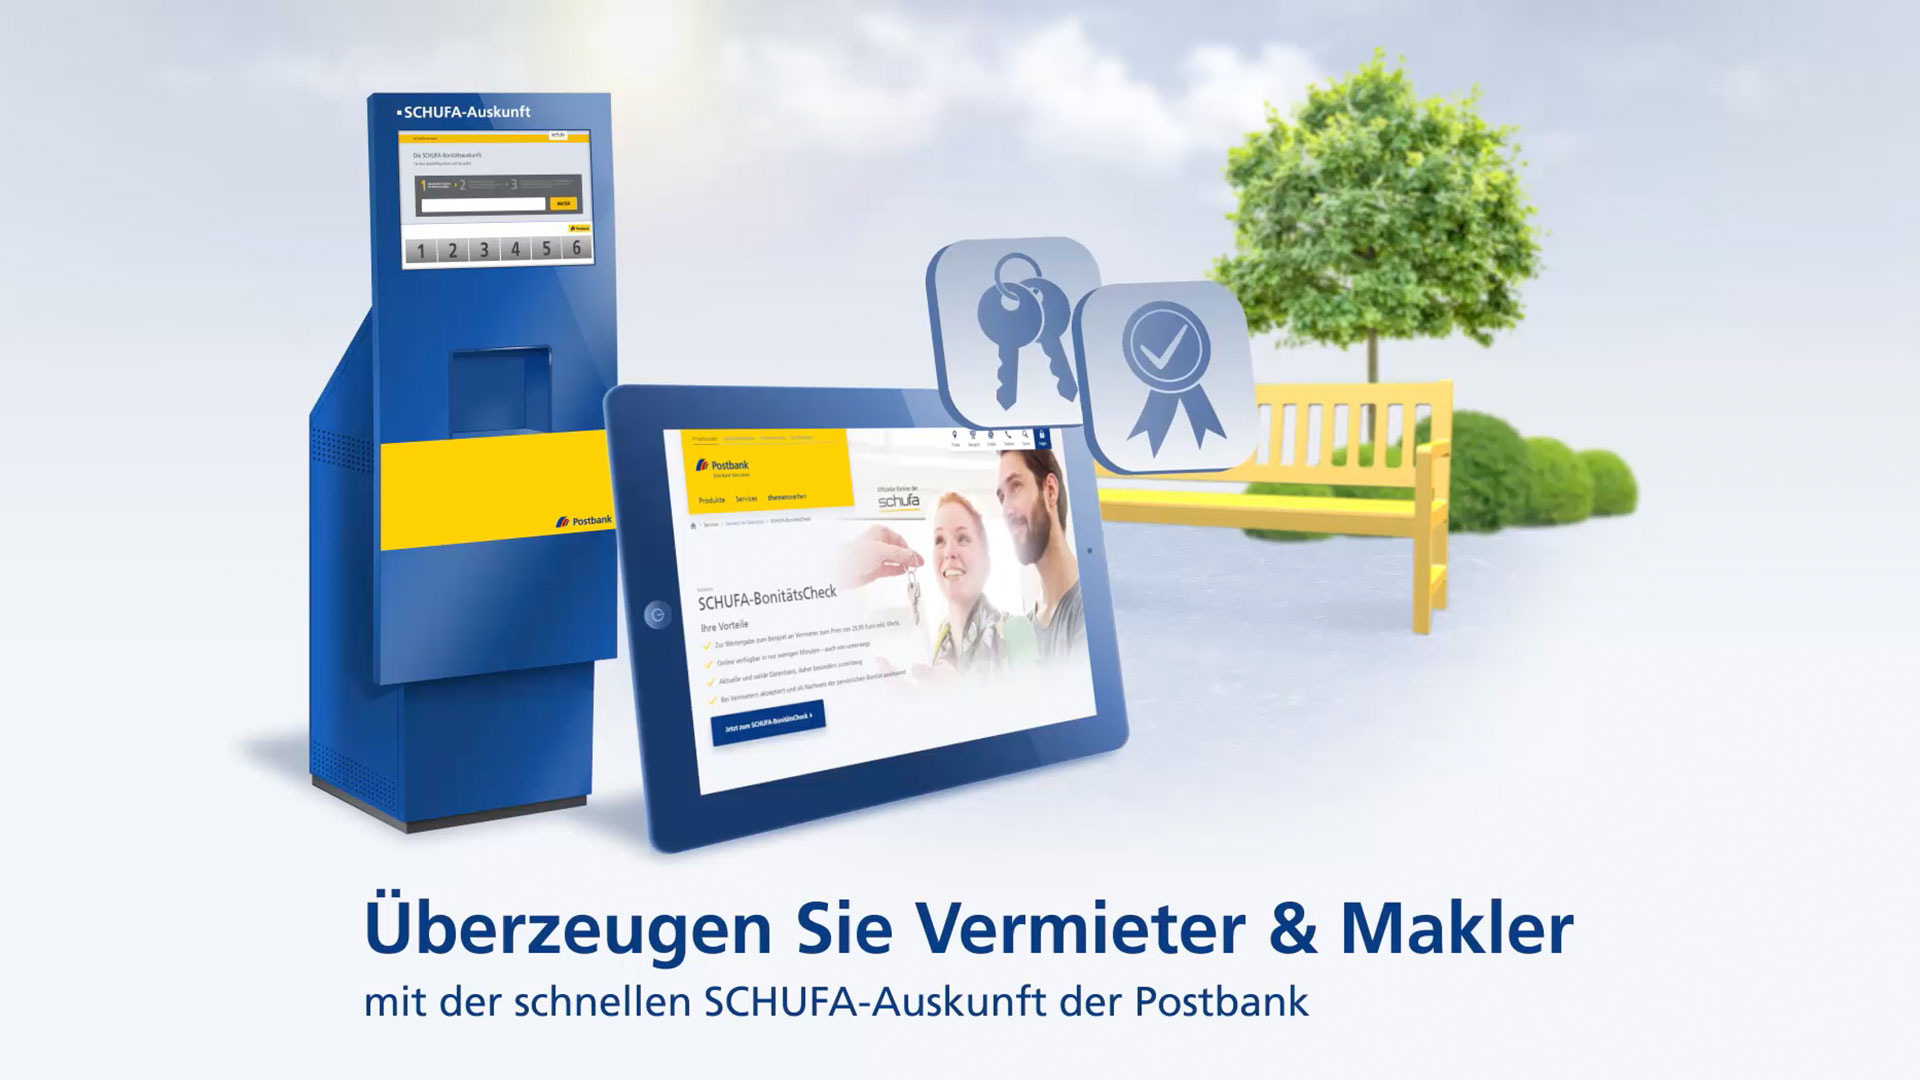 postbank-themenwelten-schufa-auskunft-bei-der-postbank-video-1920x1080.jpg